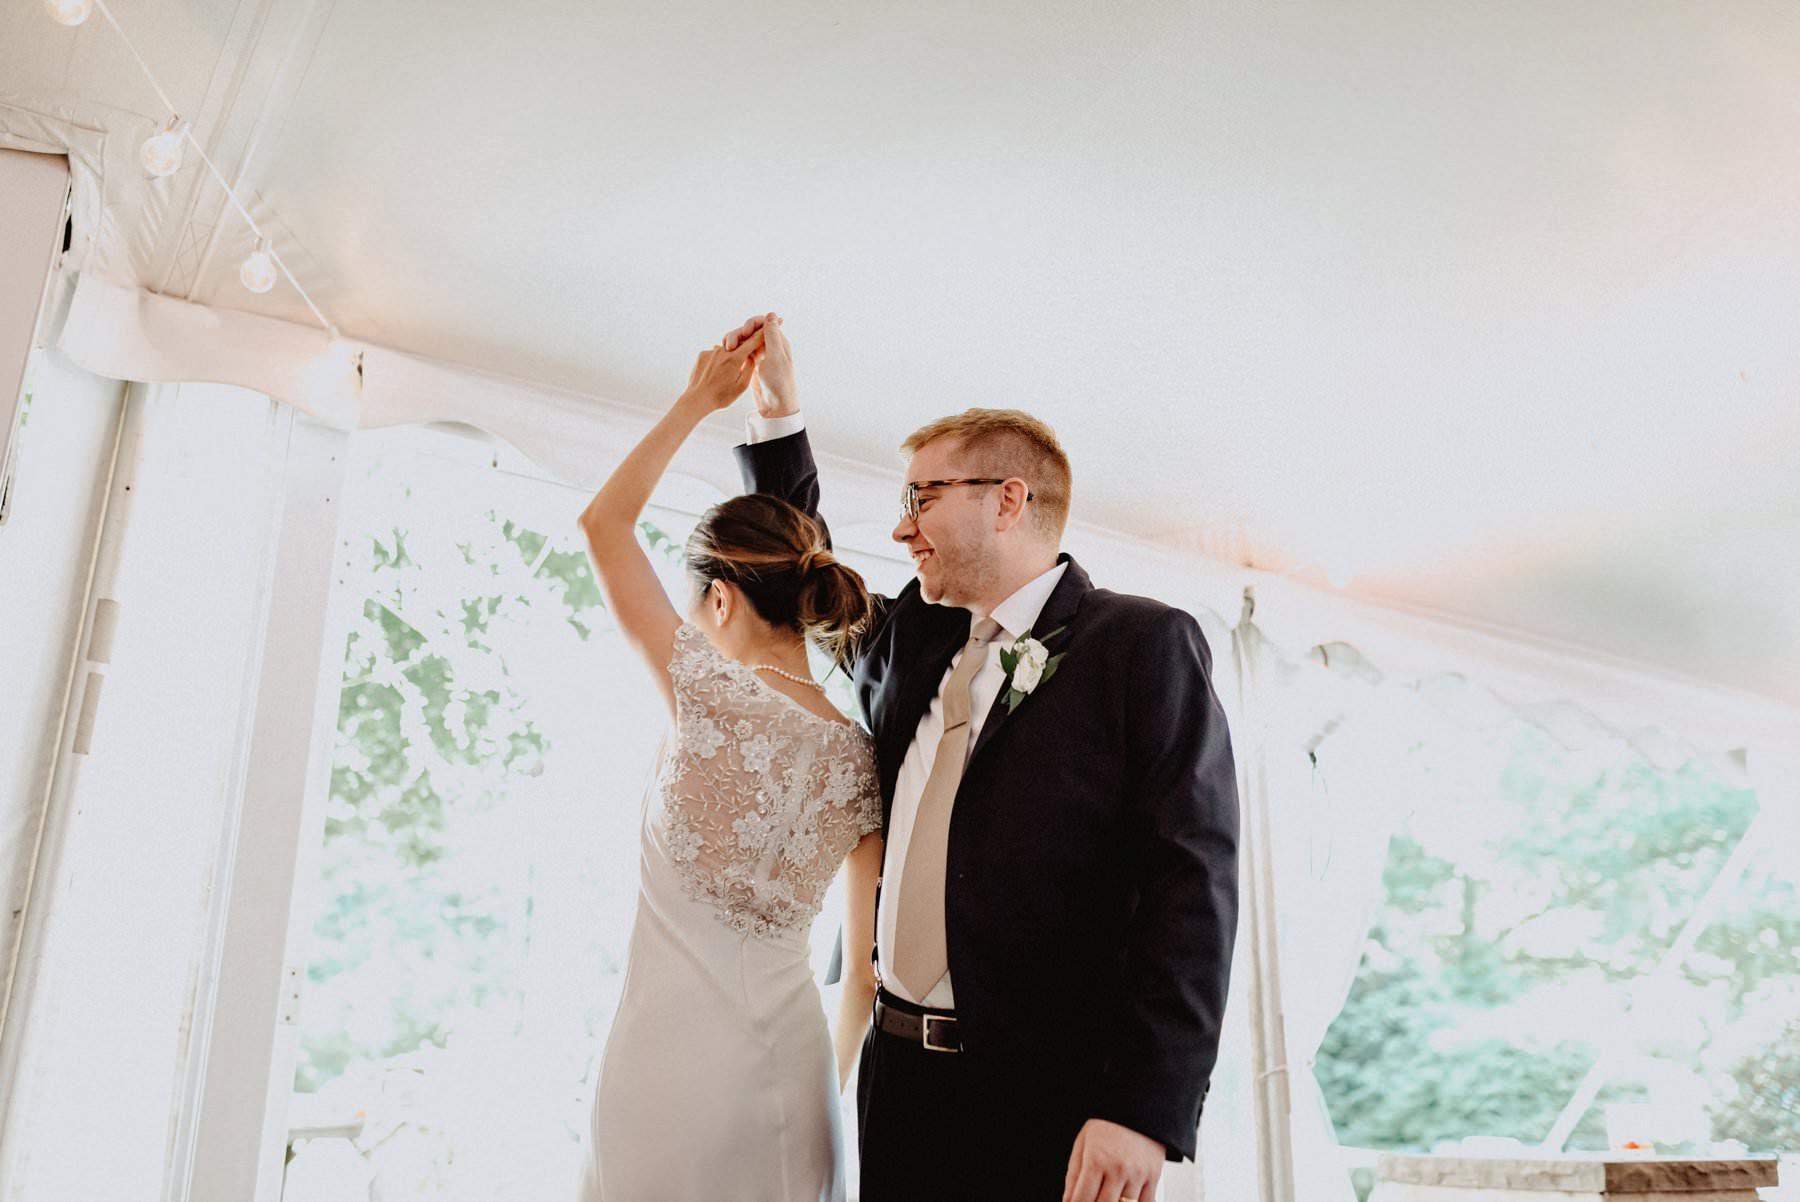 Appleford-estate-wedding-115.jpg